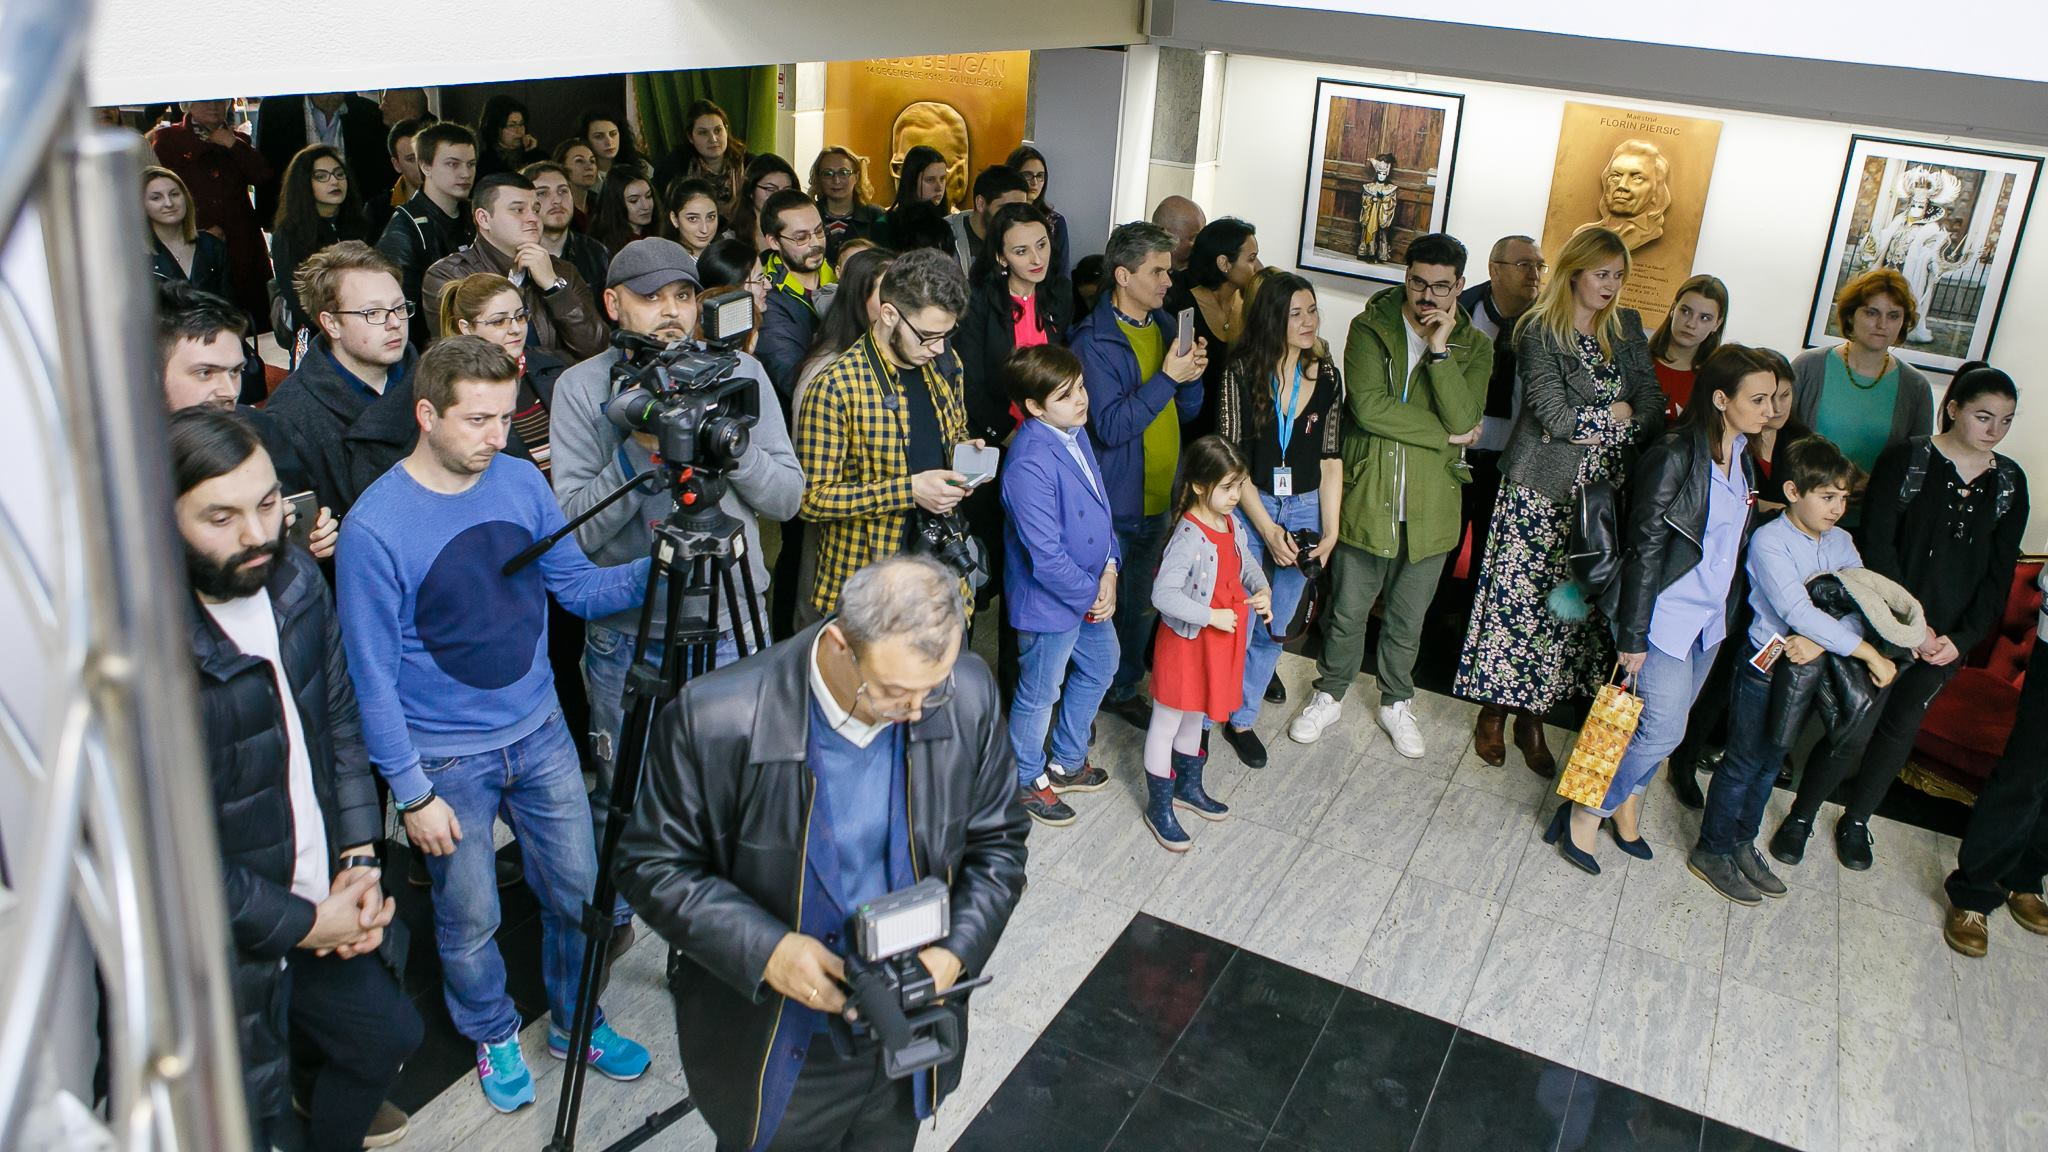 Vernisaj Expozitie de Fotografie Povesti Venetiene Paul Padurariu fotograf profesionist Iasi - invitati presa